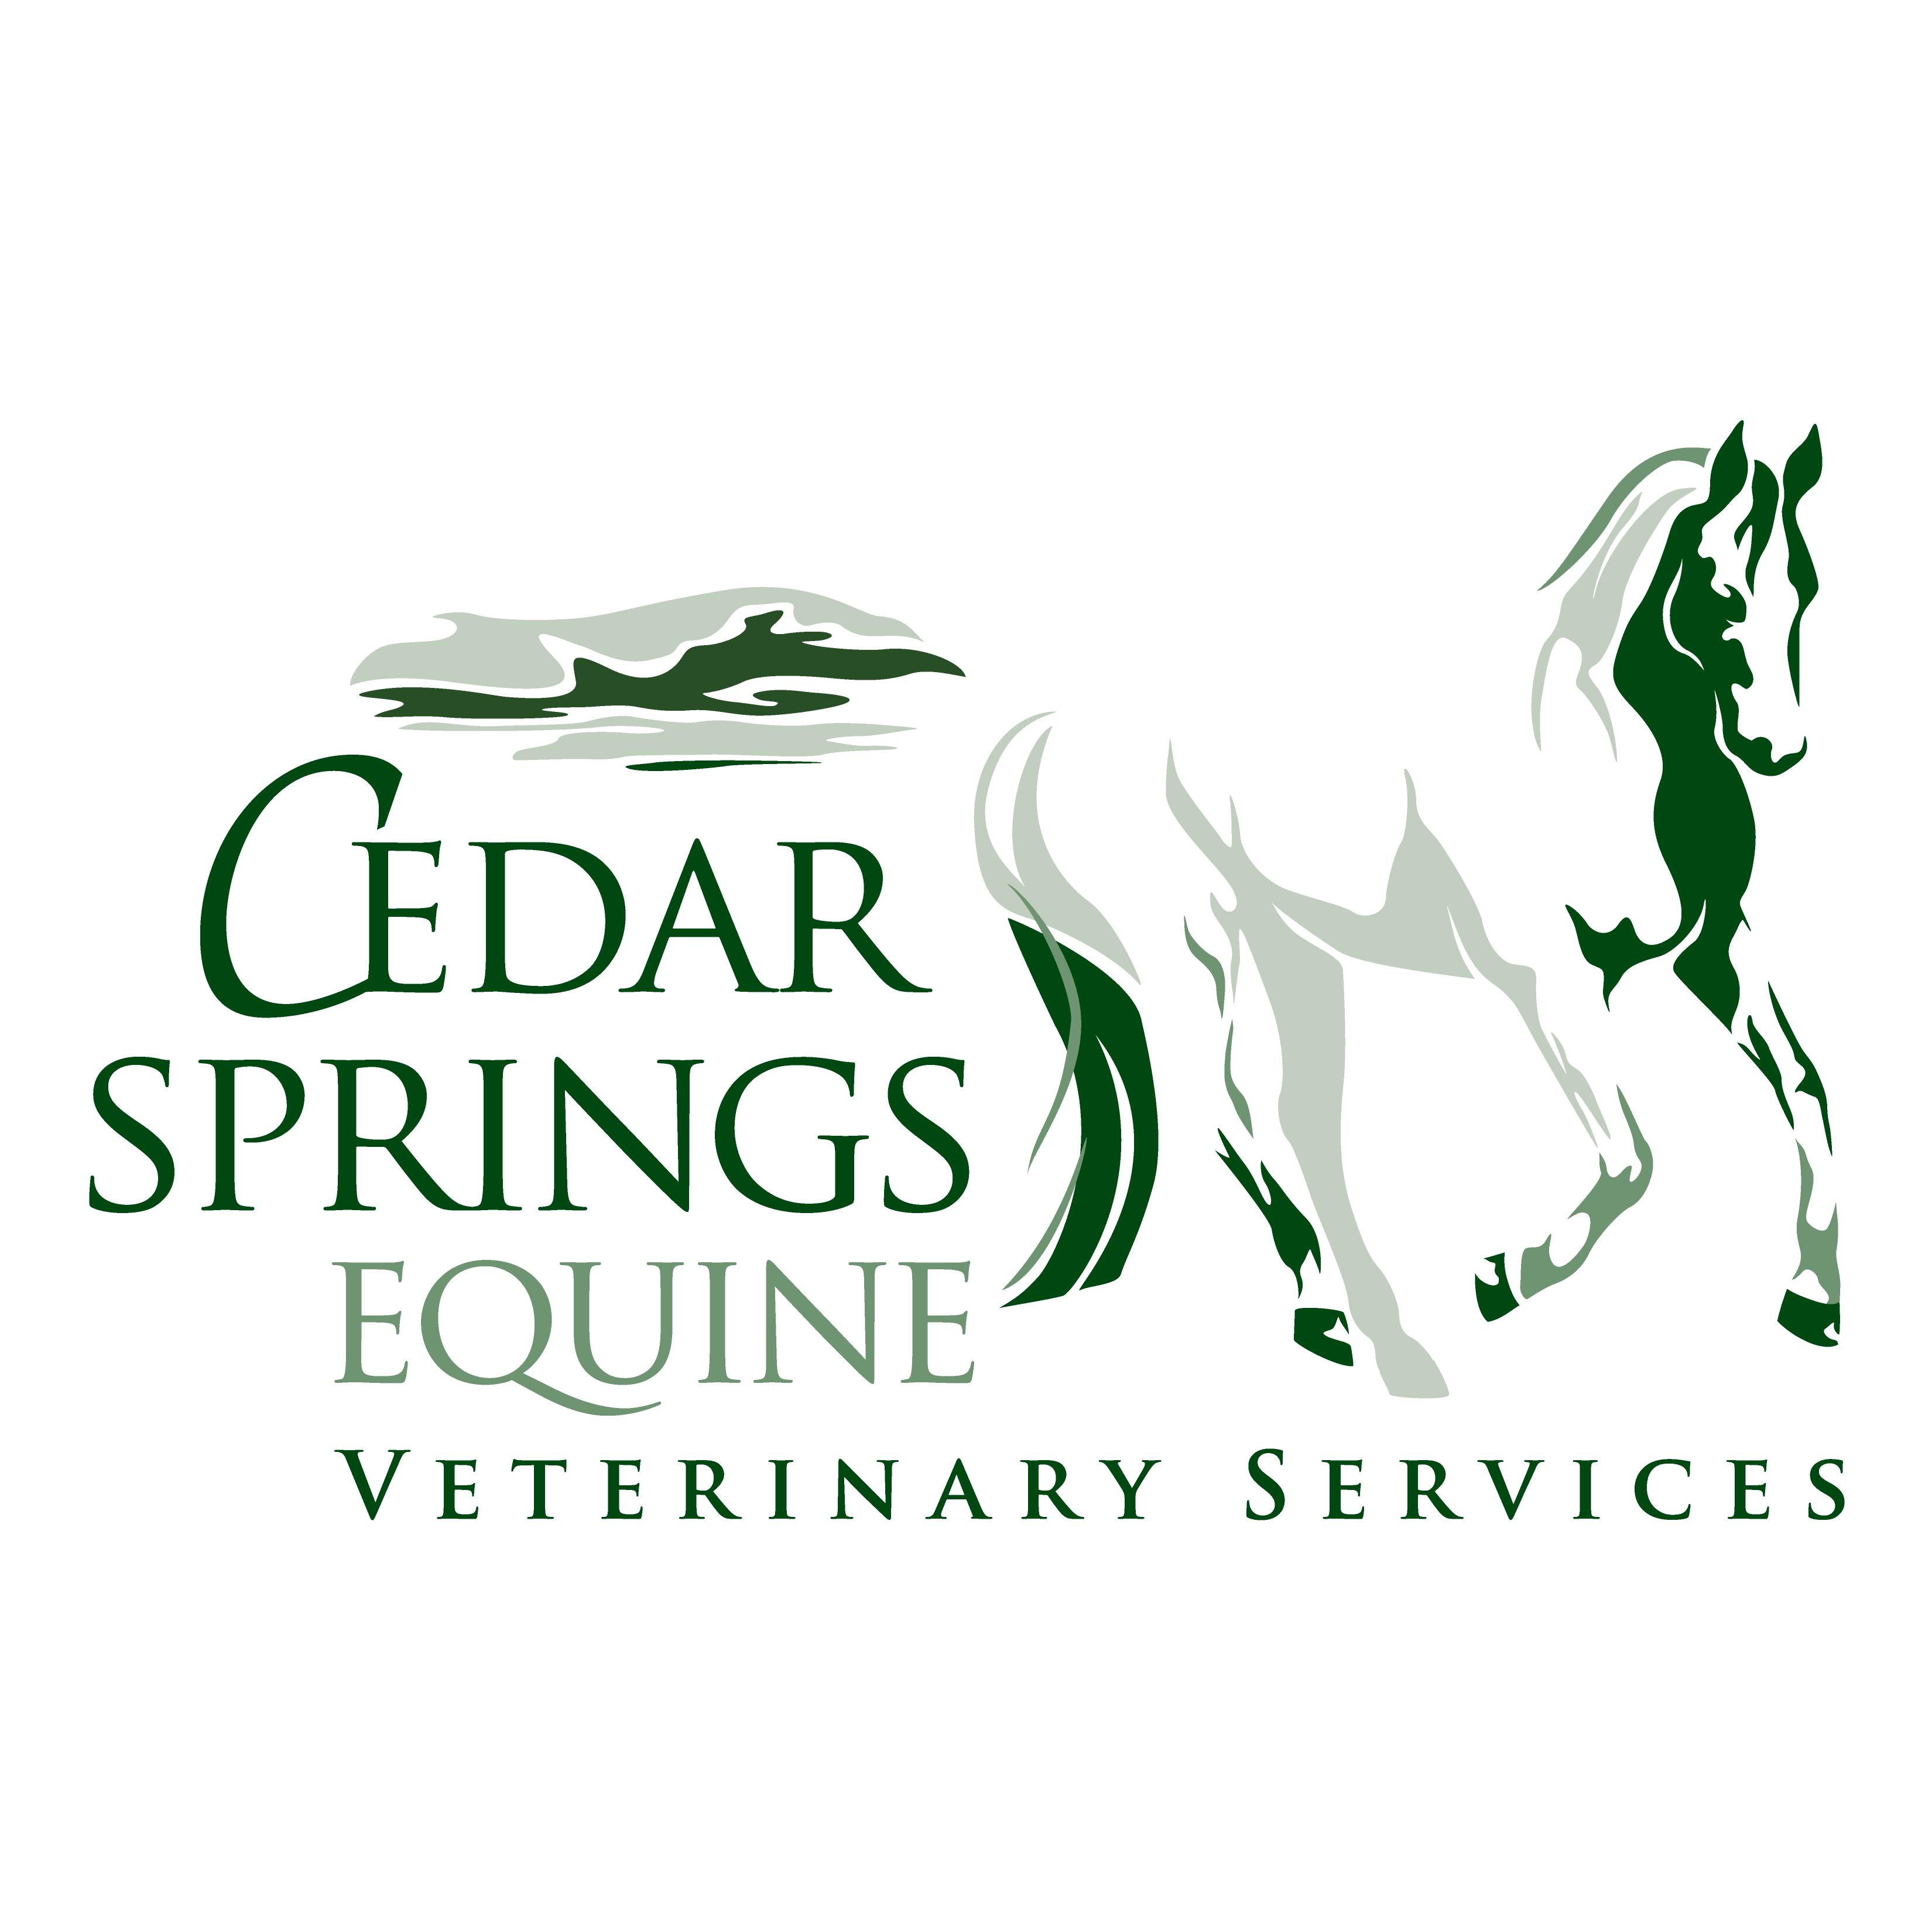 Cedar Springs Equine Veterinary Services